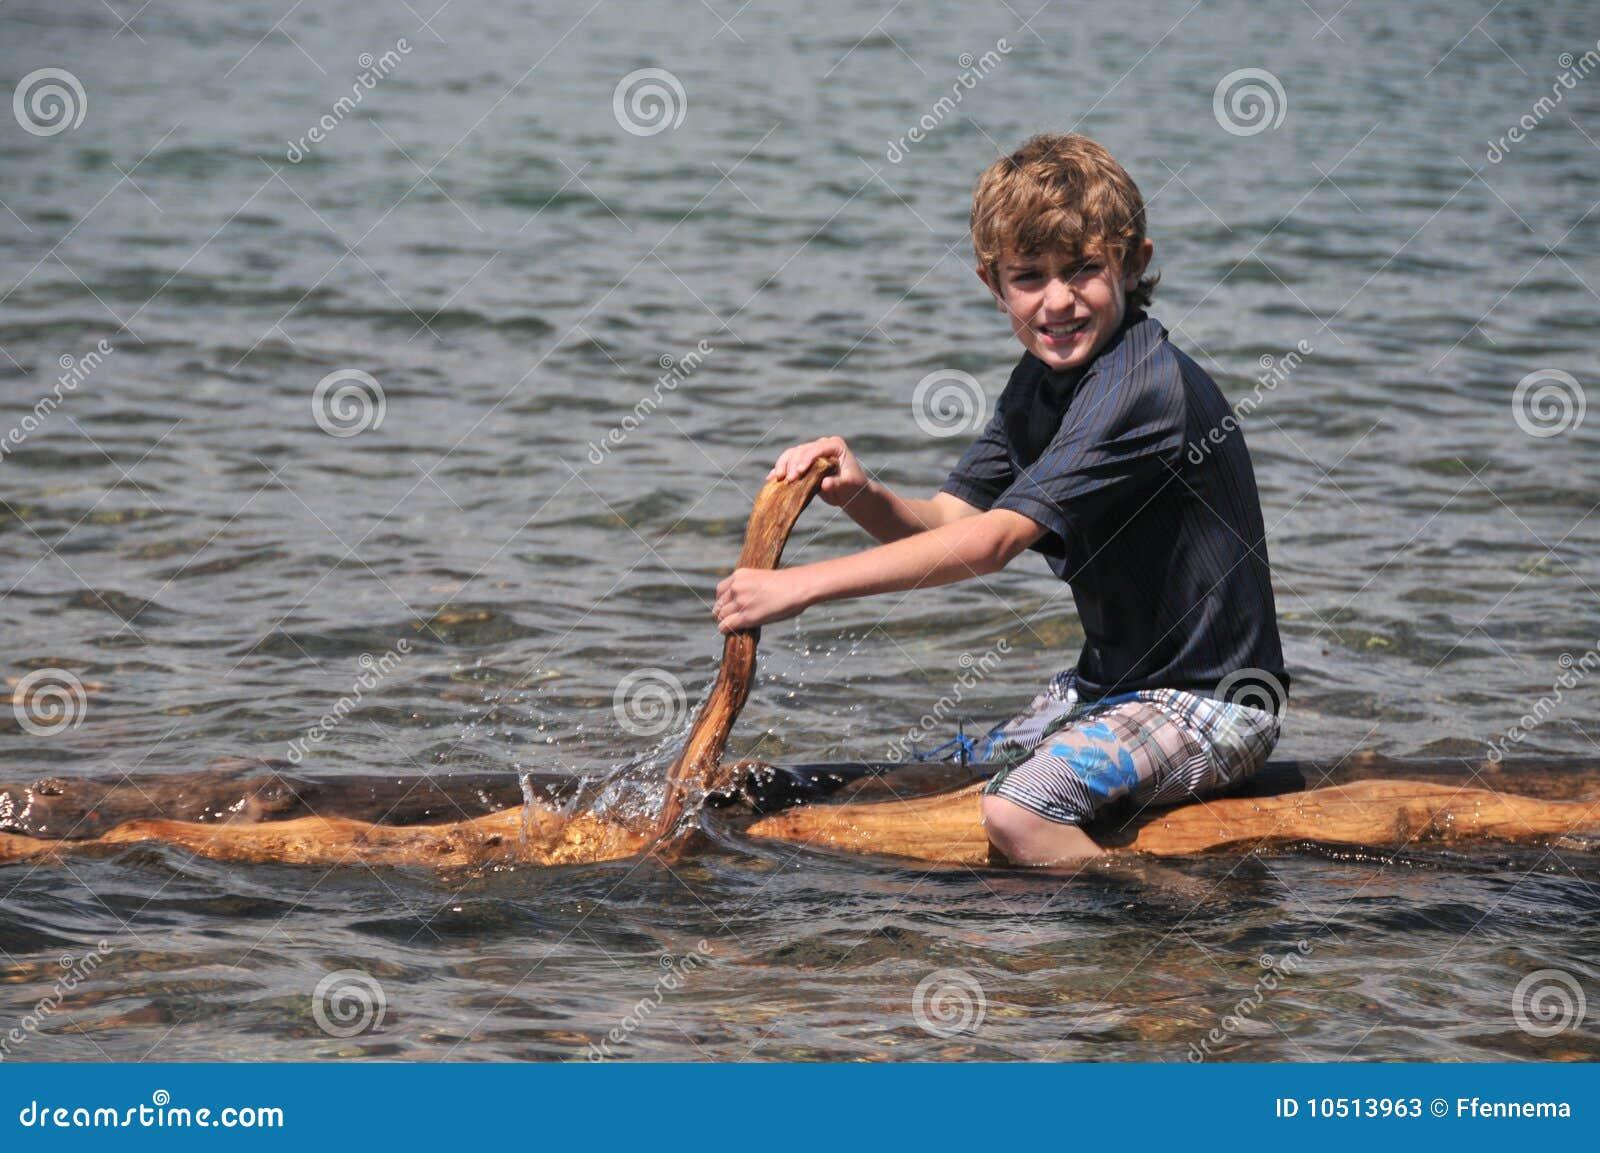 Boy Paddles A Raft On Lake Stock Photos Image 10513963